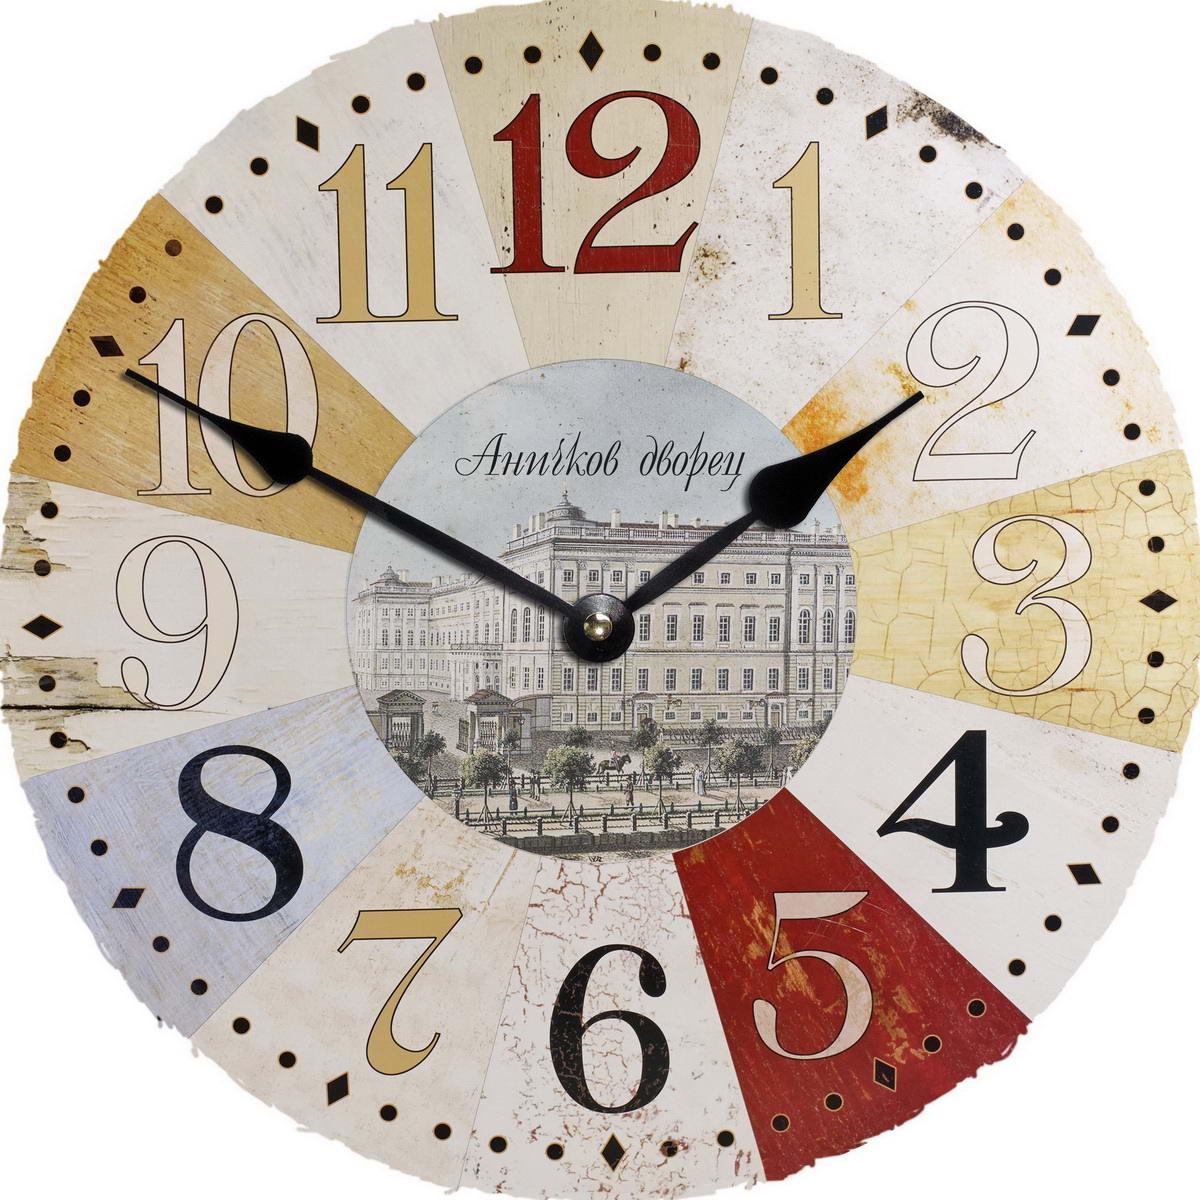 60cm-round-shabby-wall-clock-040336-2-1